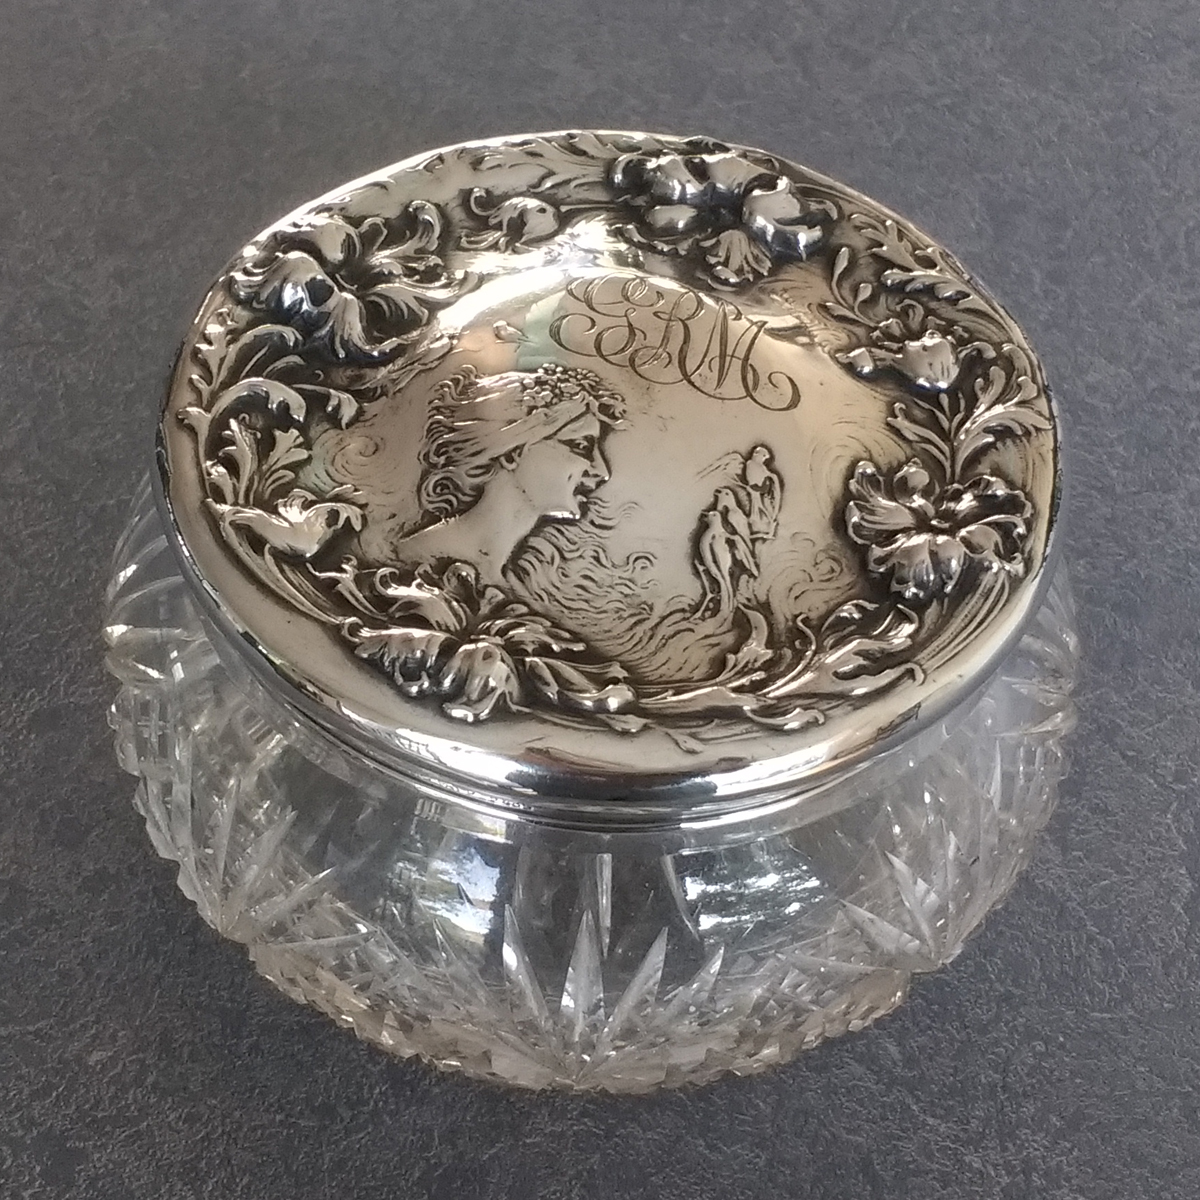 Sterling silver dresser set lid with dents removed